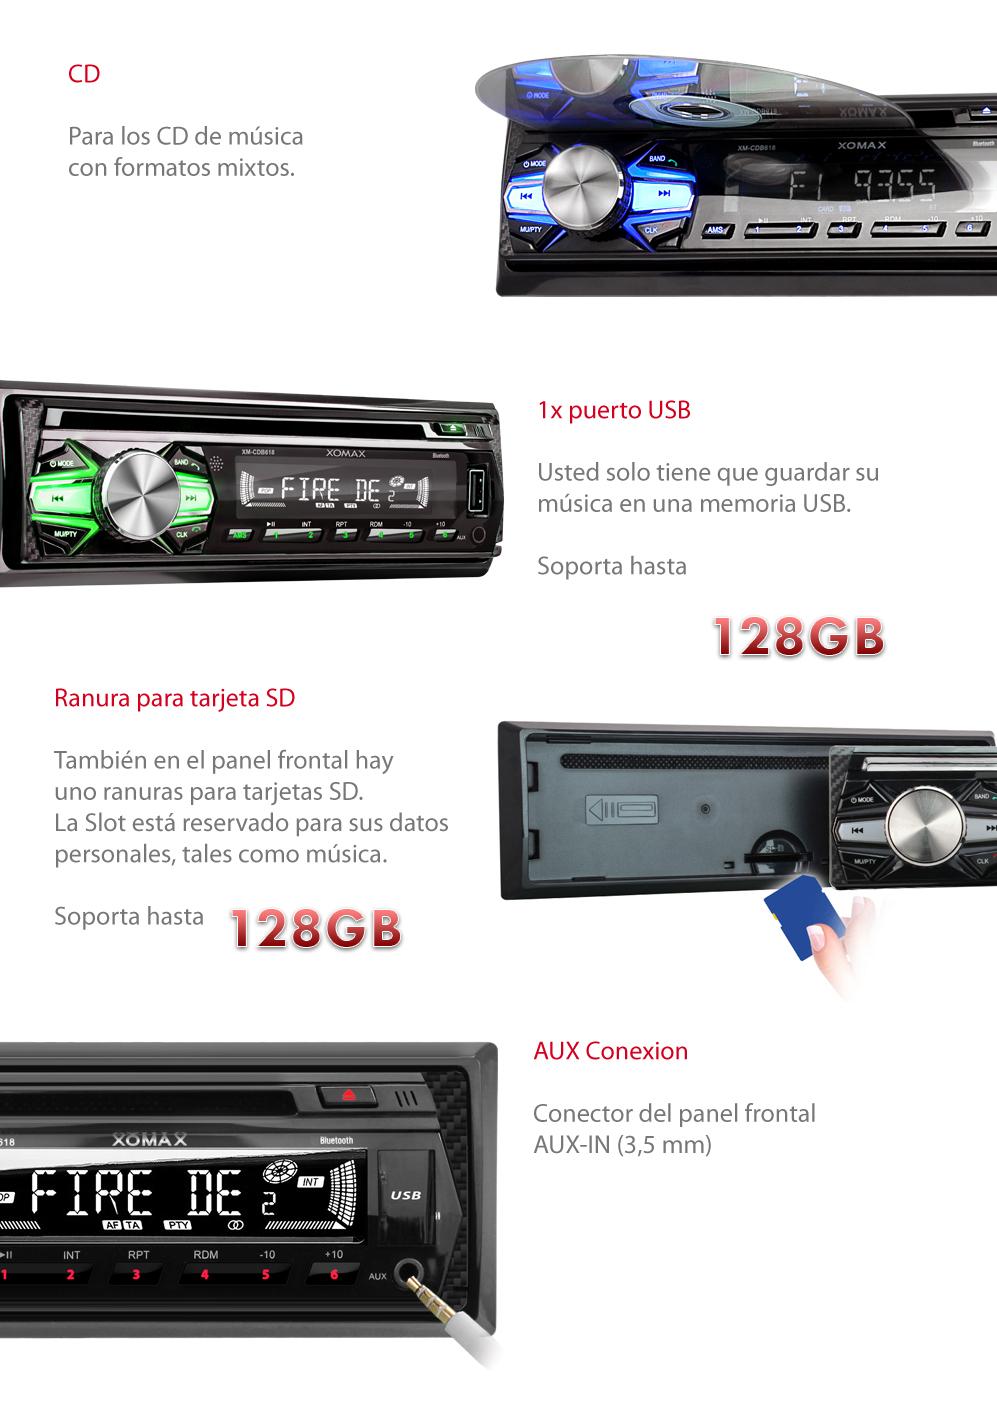 Radio de coche autorradio con lector cd bluetooth manos libres usb sd mp3 1din ebay - Lecteur cd pour voiture avec port usb ...